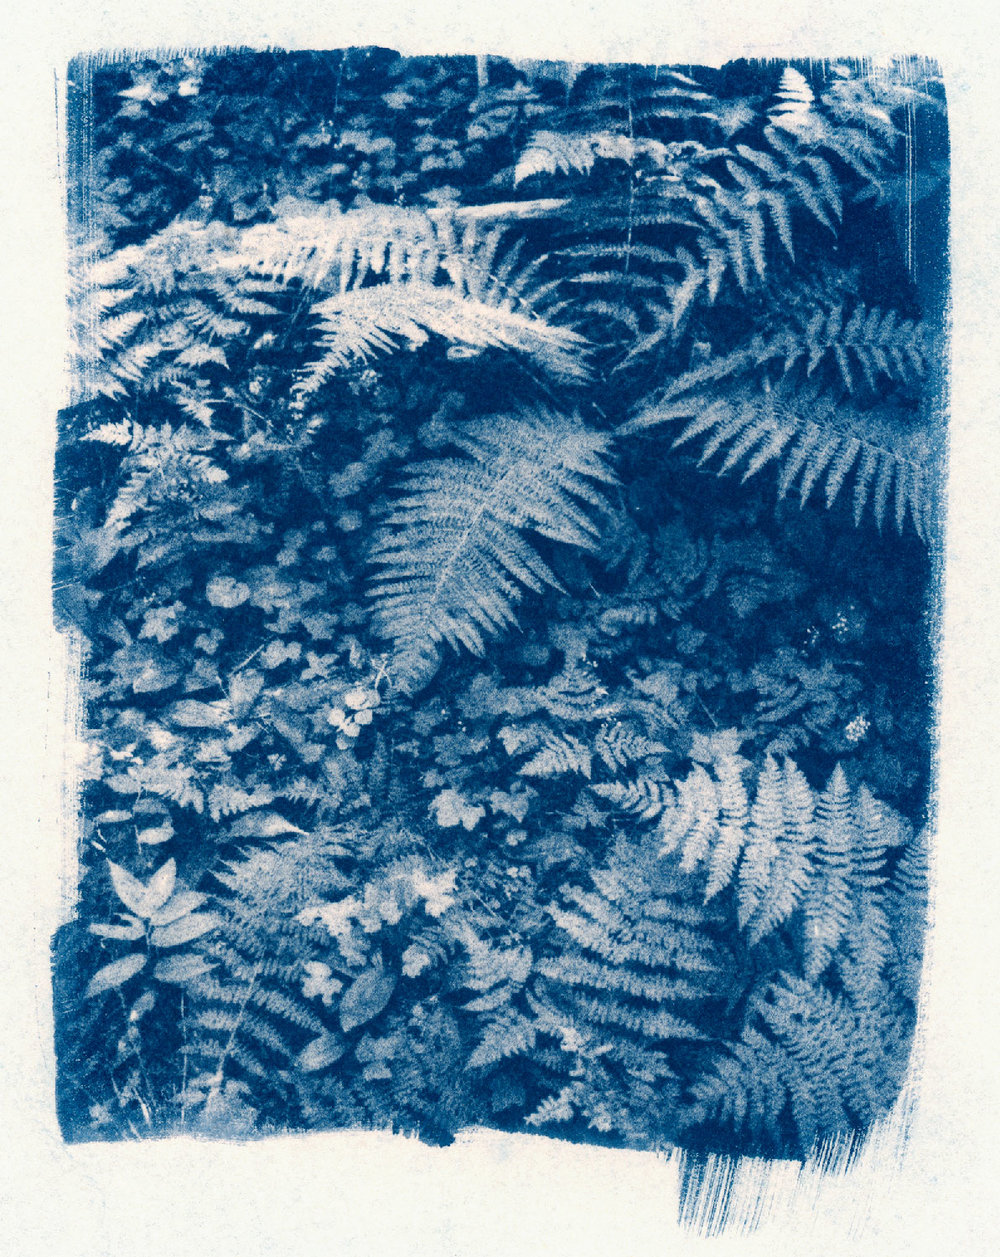 sleeping on blankets of fern